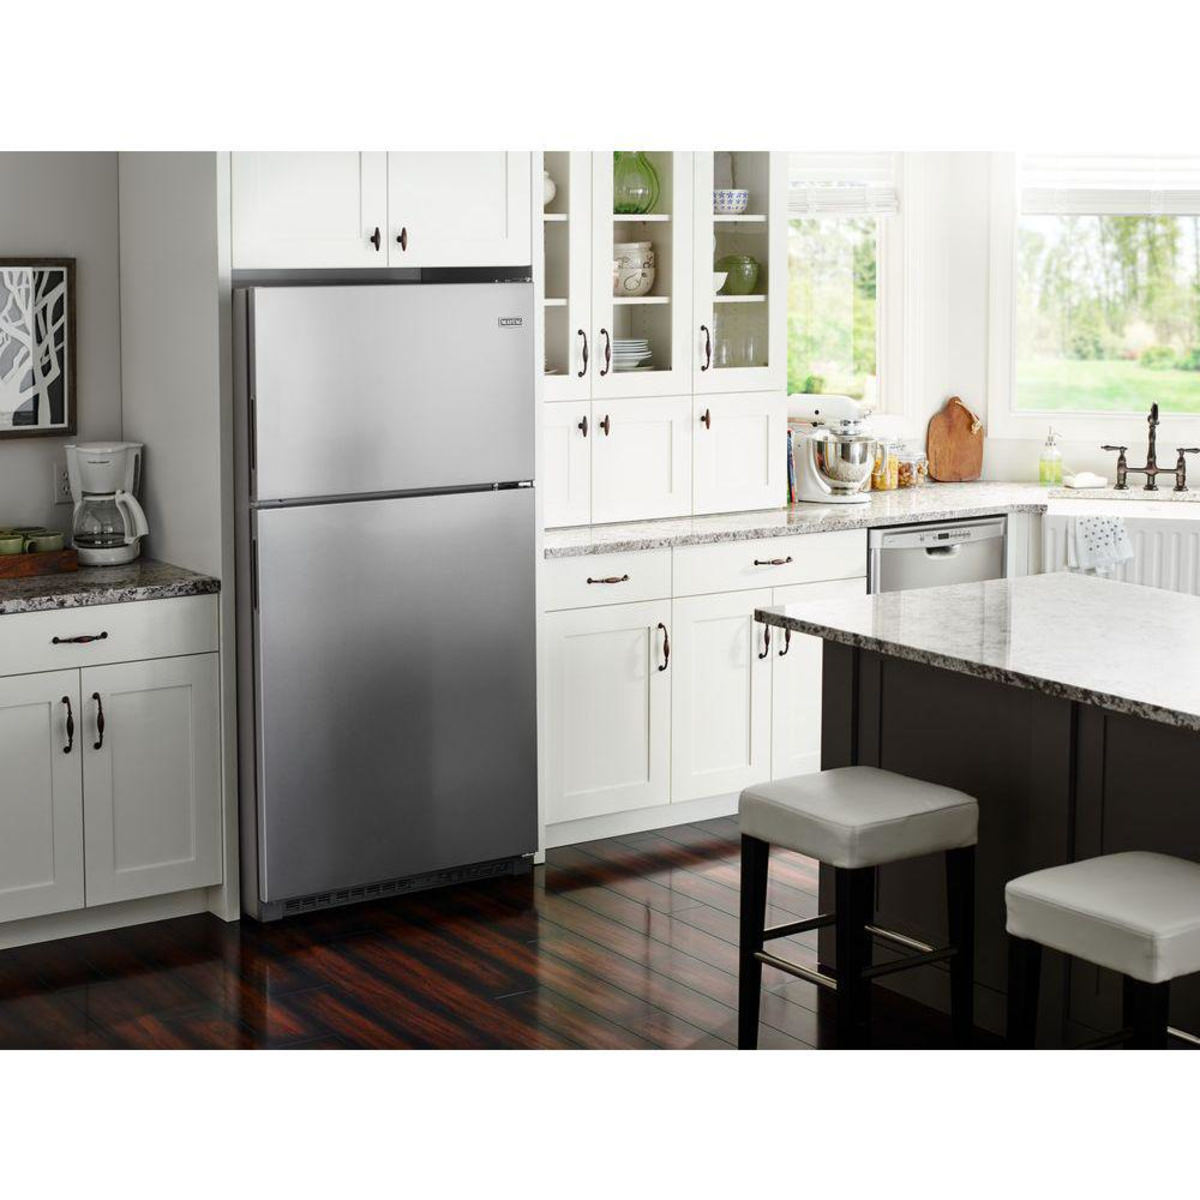 Maytag Mrt118fffz 30 Inch Top Freezer Refrigerator